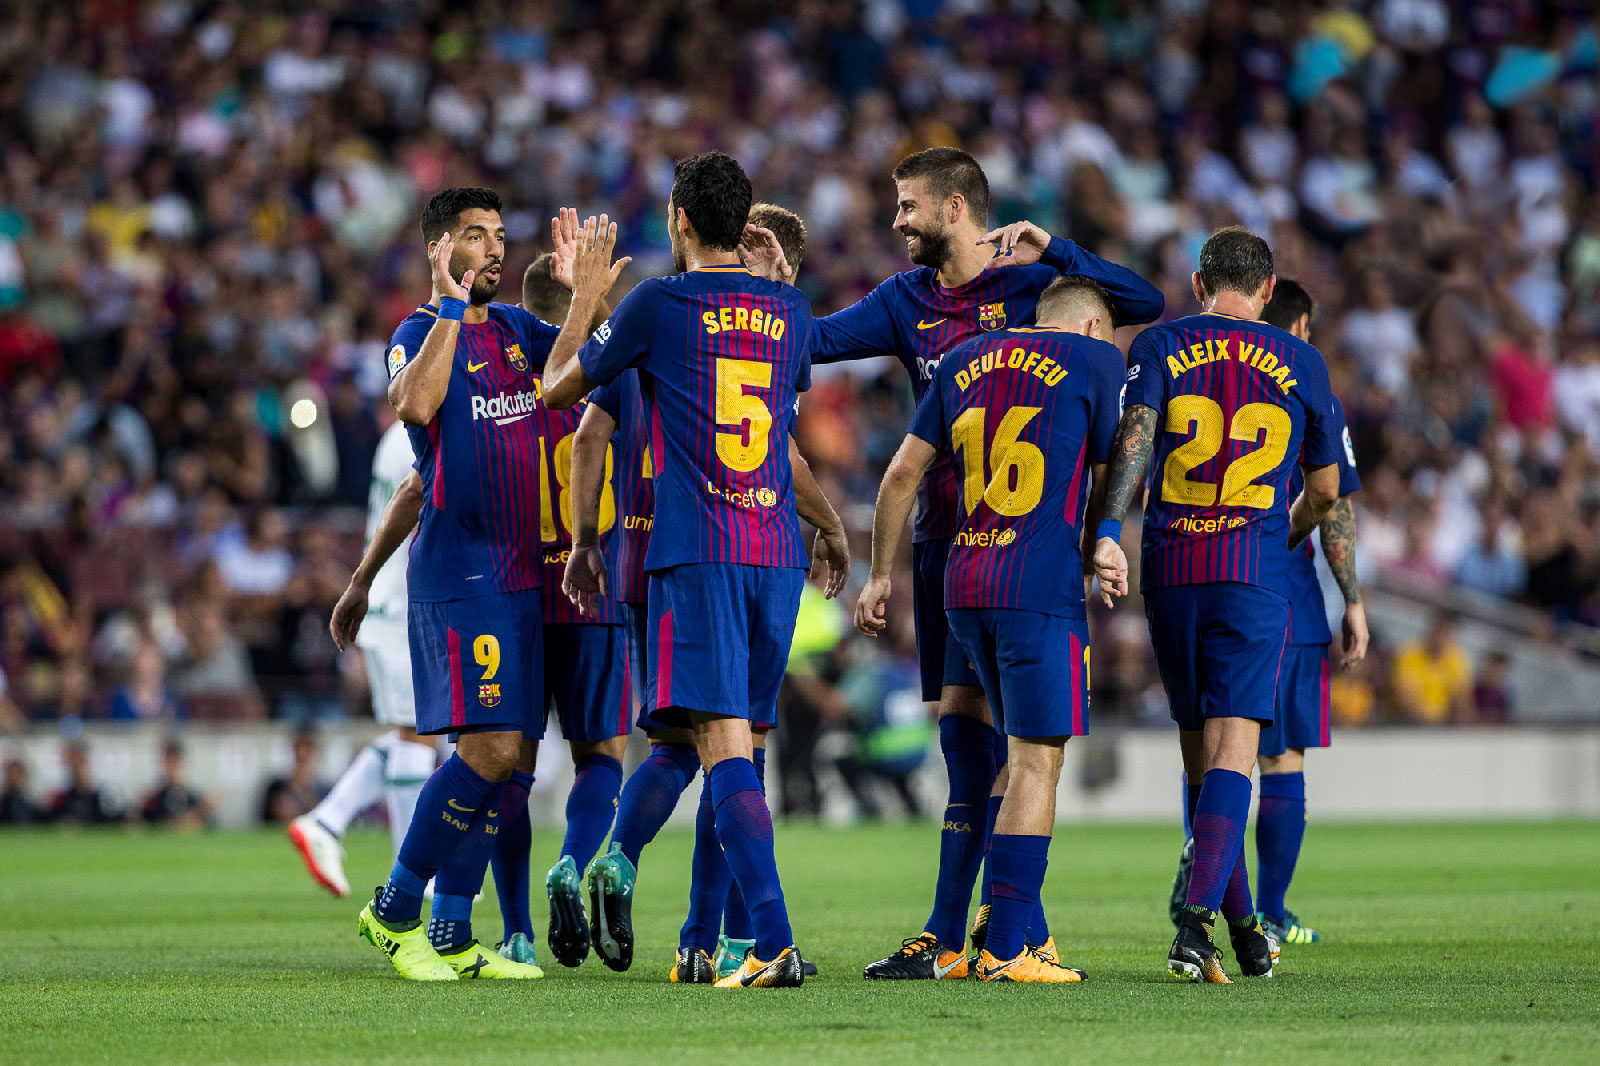 fc_barcelona_football_tickets